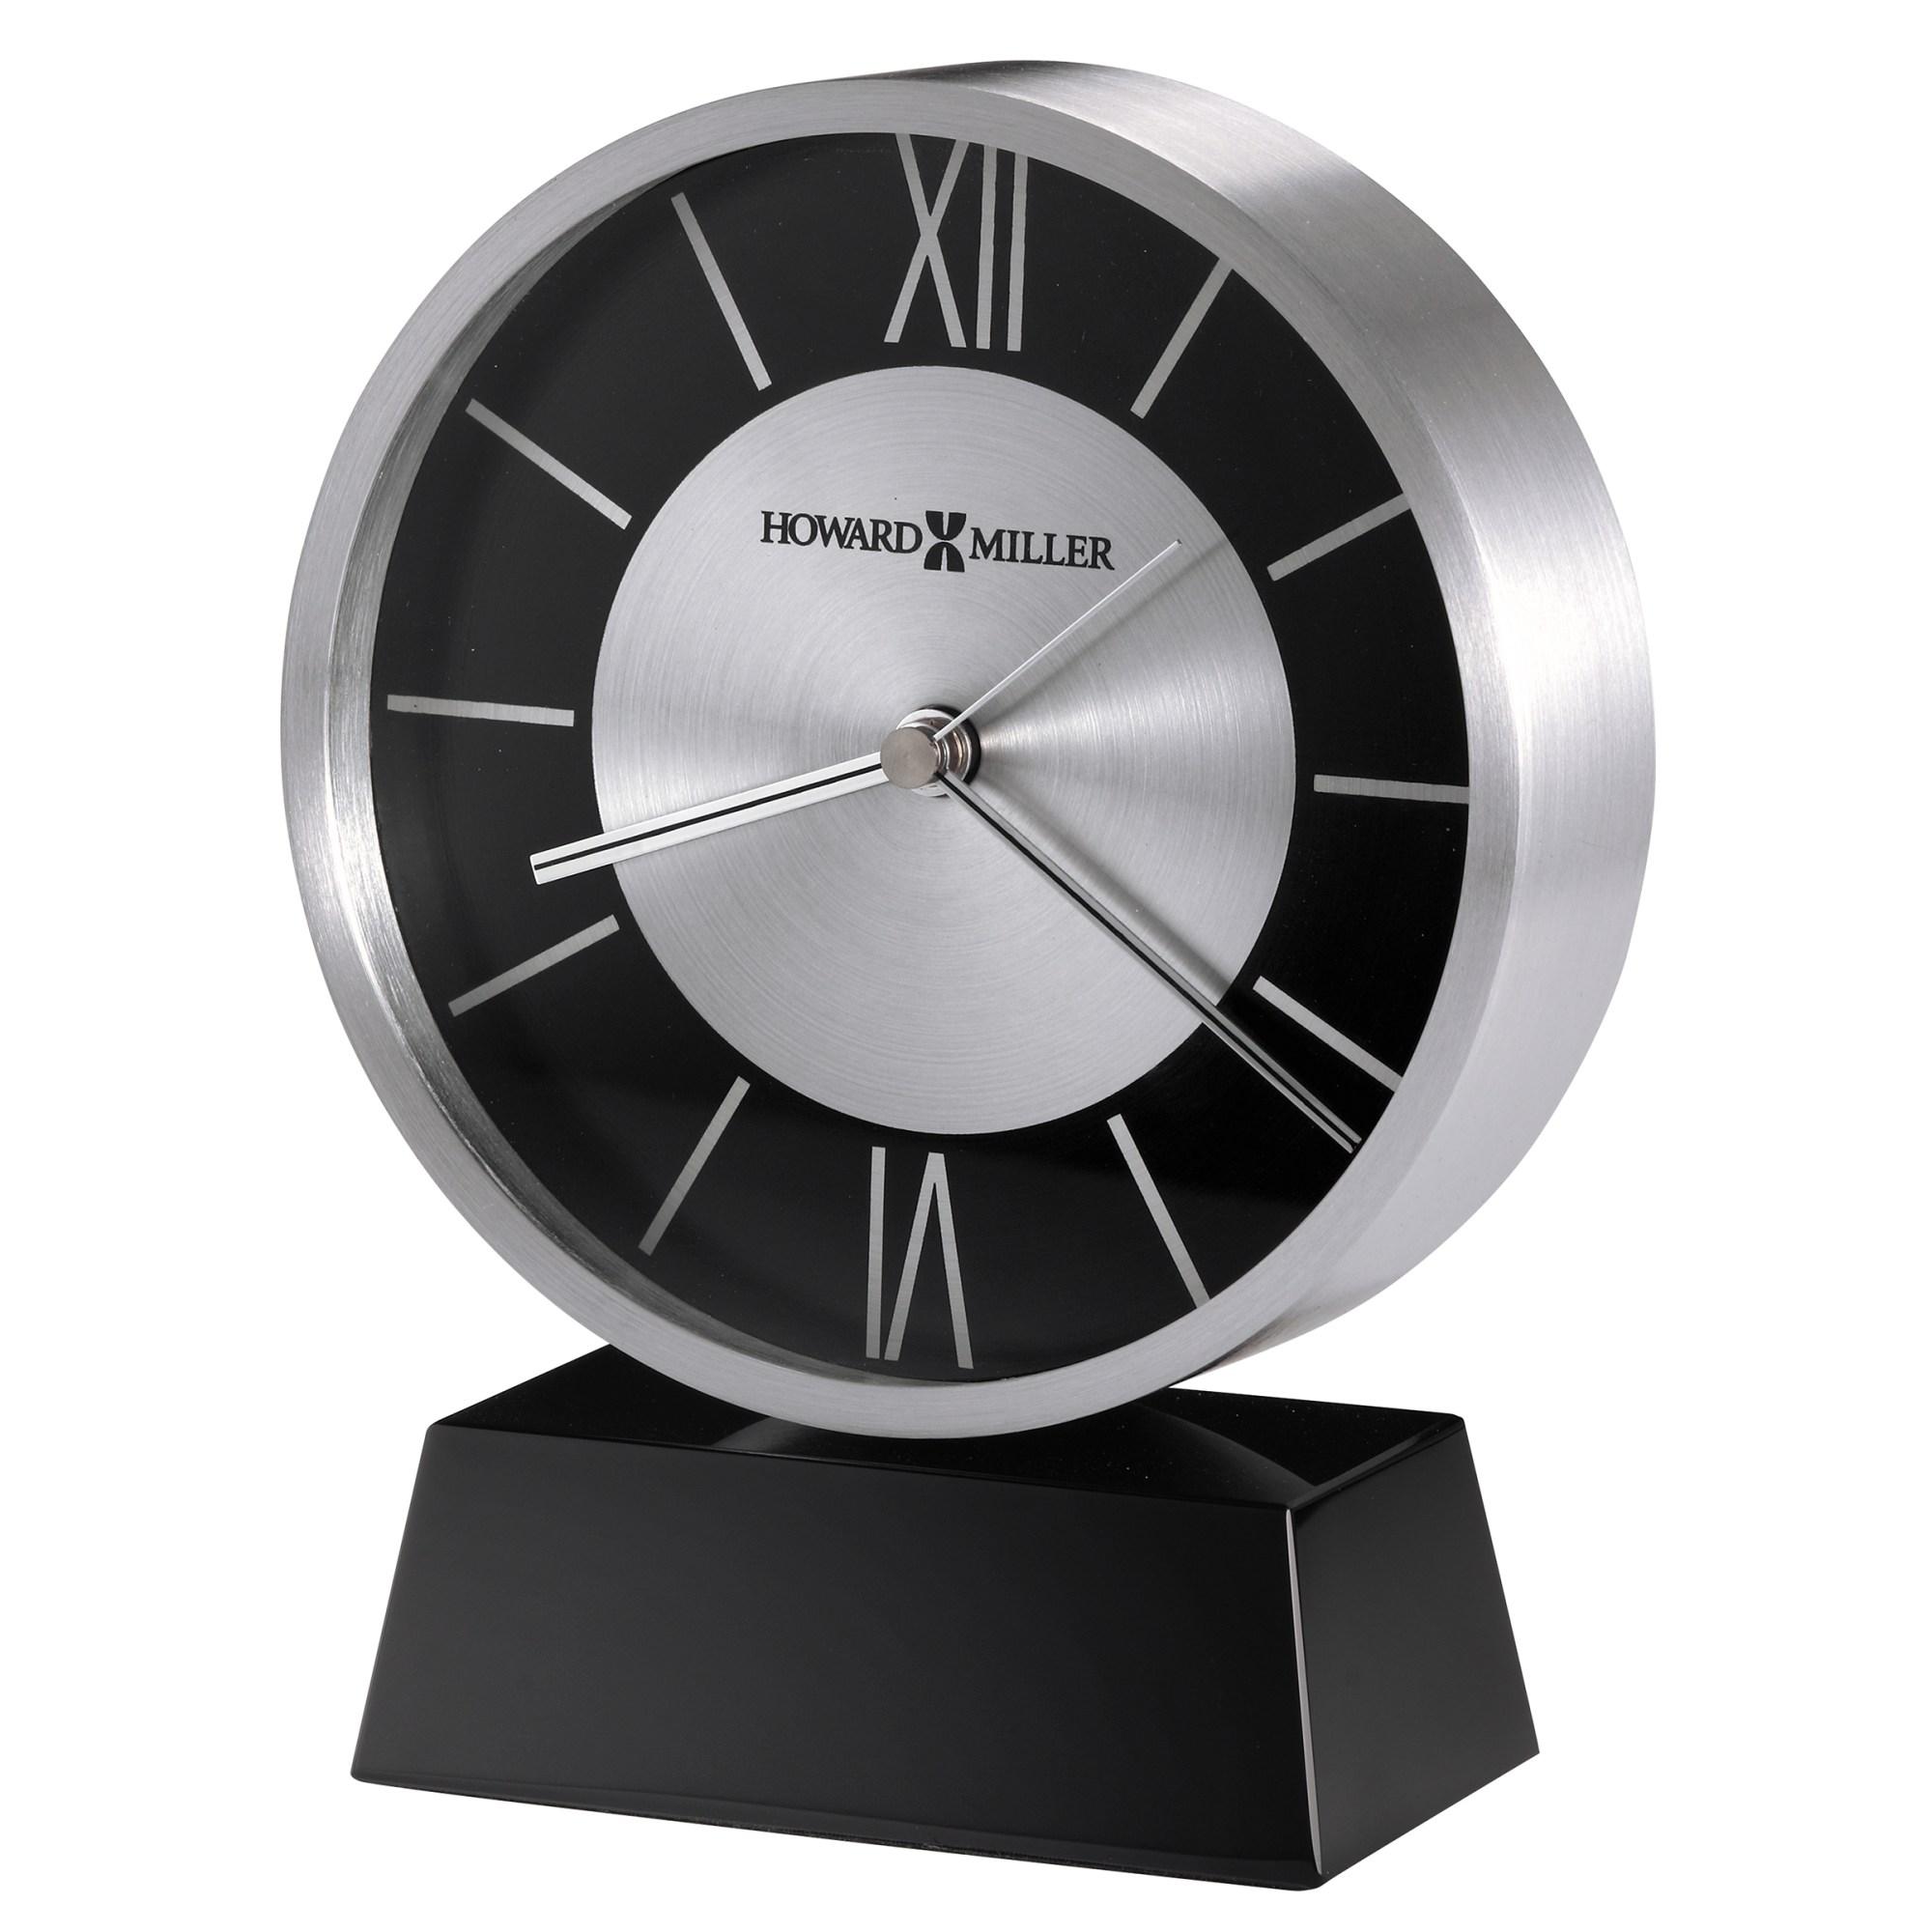 Image for Howard Miller Davis Table Clock 645787 from Howard Miller Official Website